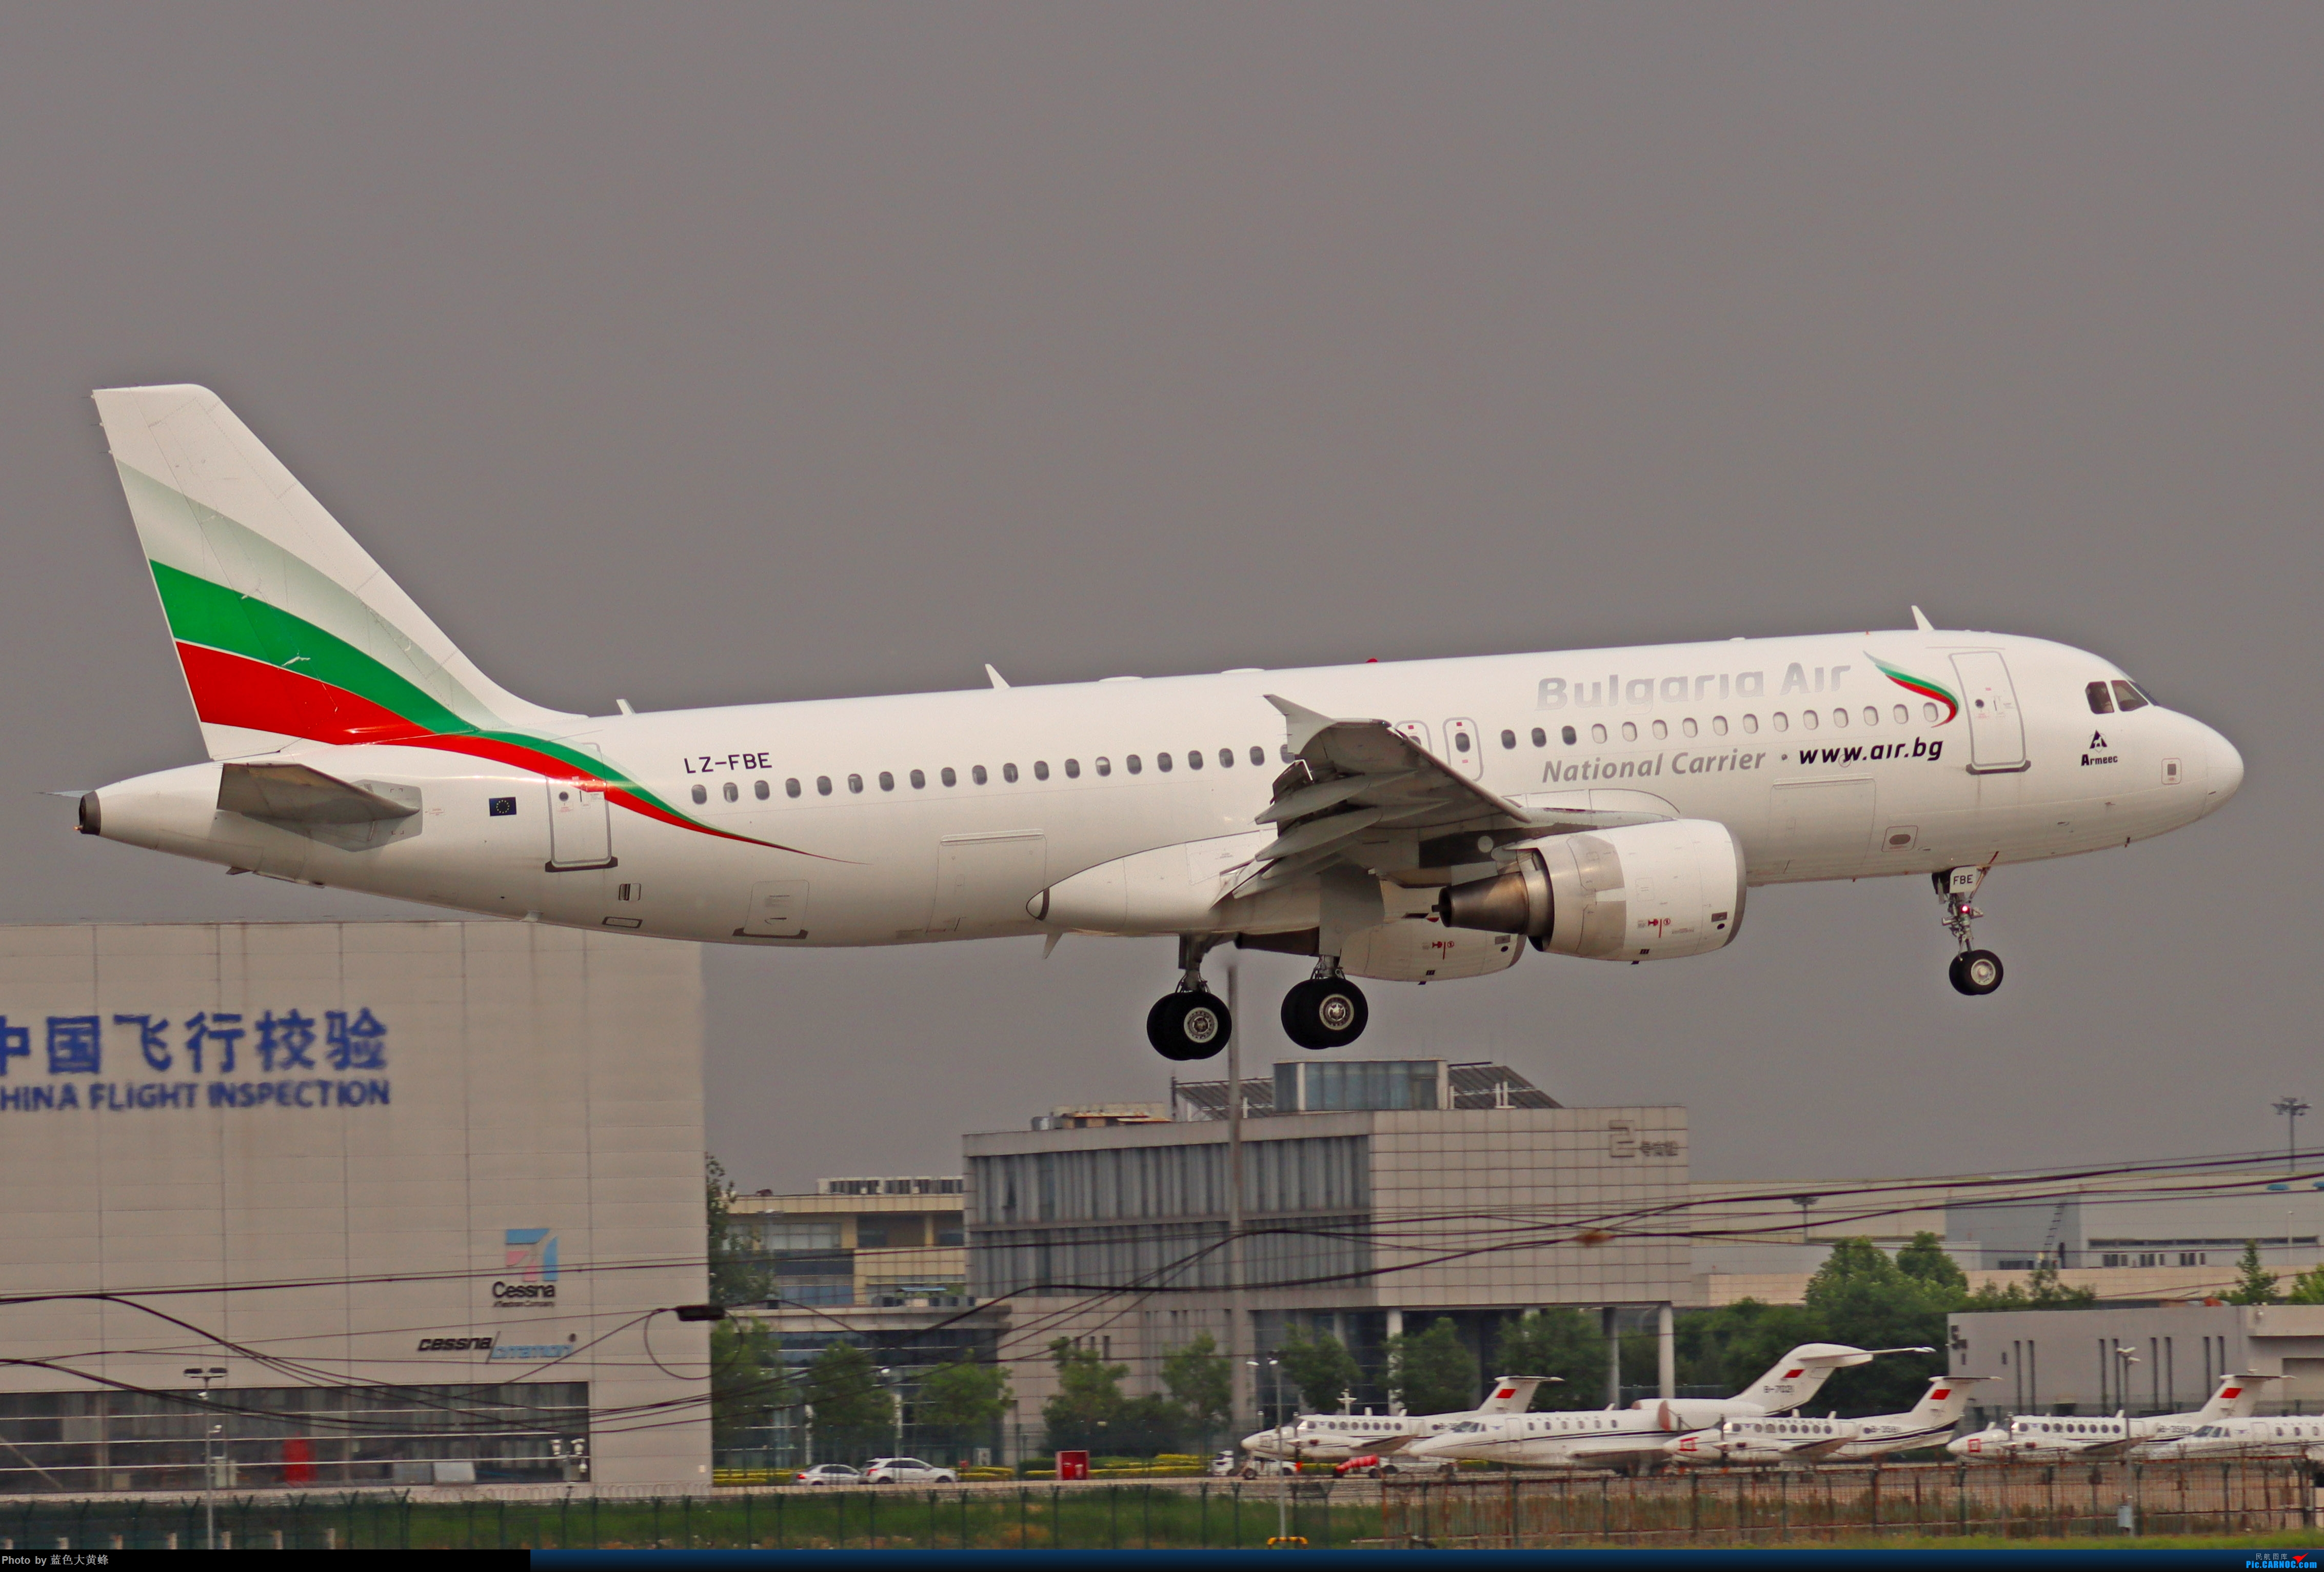 Re:[原创]2020.5.30PEK拍机,偶遇联邦的MD11给18R降落,实属罕见 AIRBUS A320-200 LZ-FBE 中国北京首都国际机场